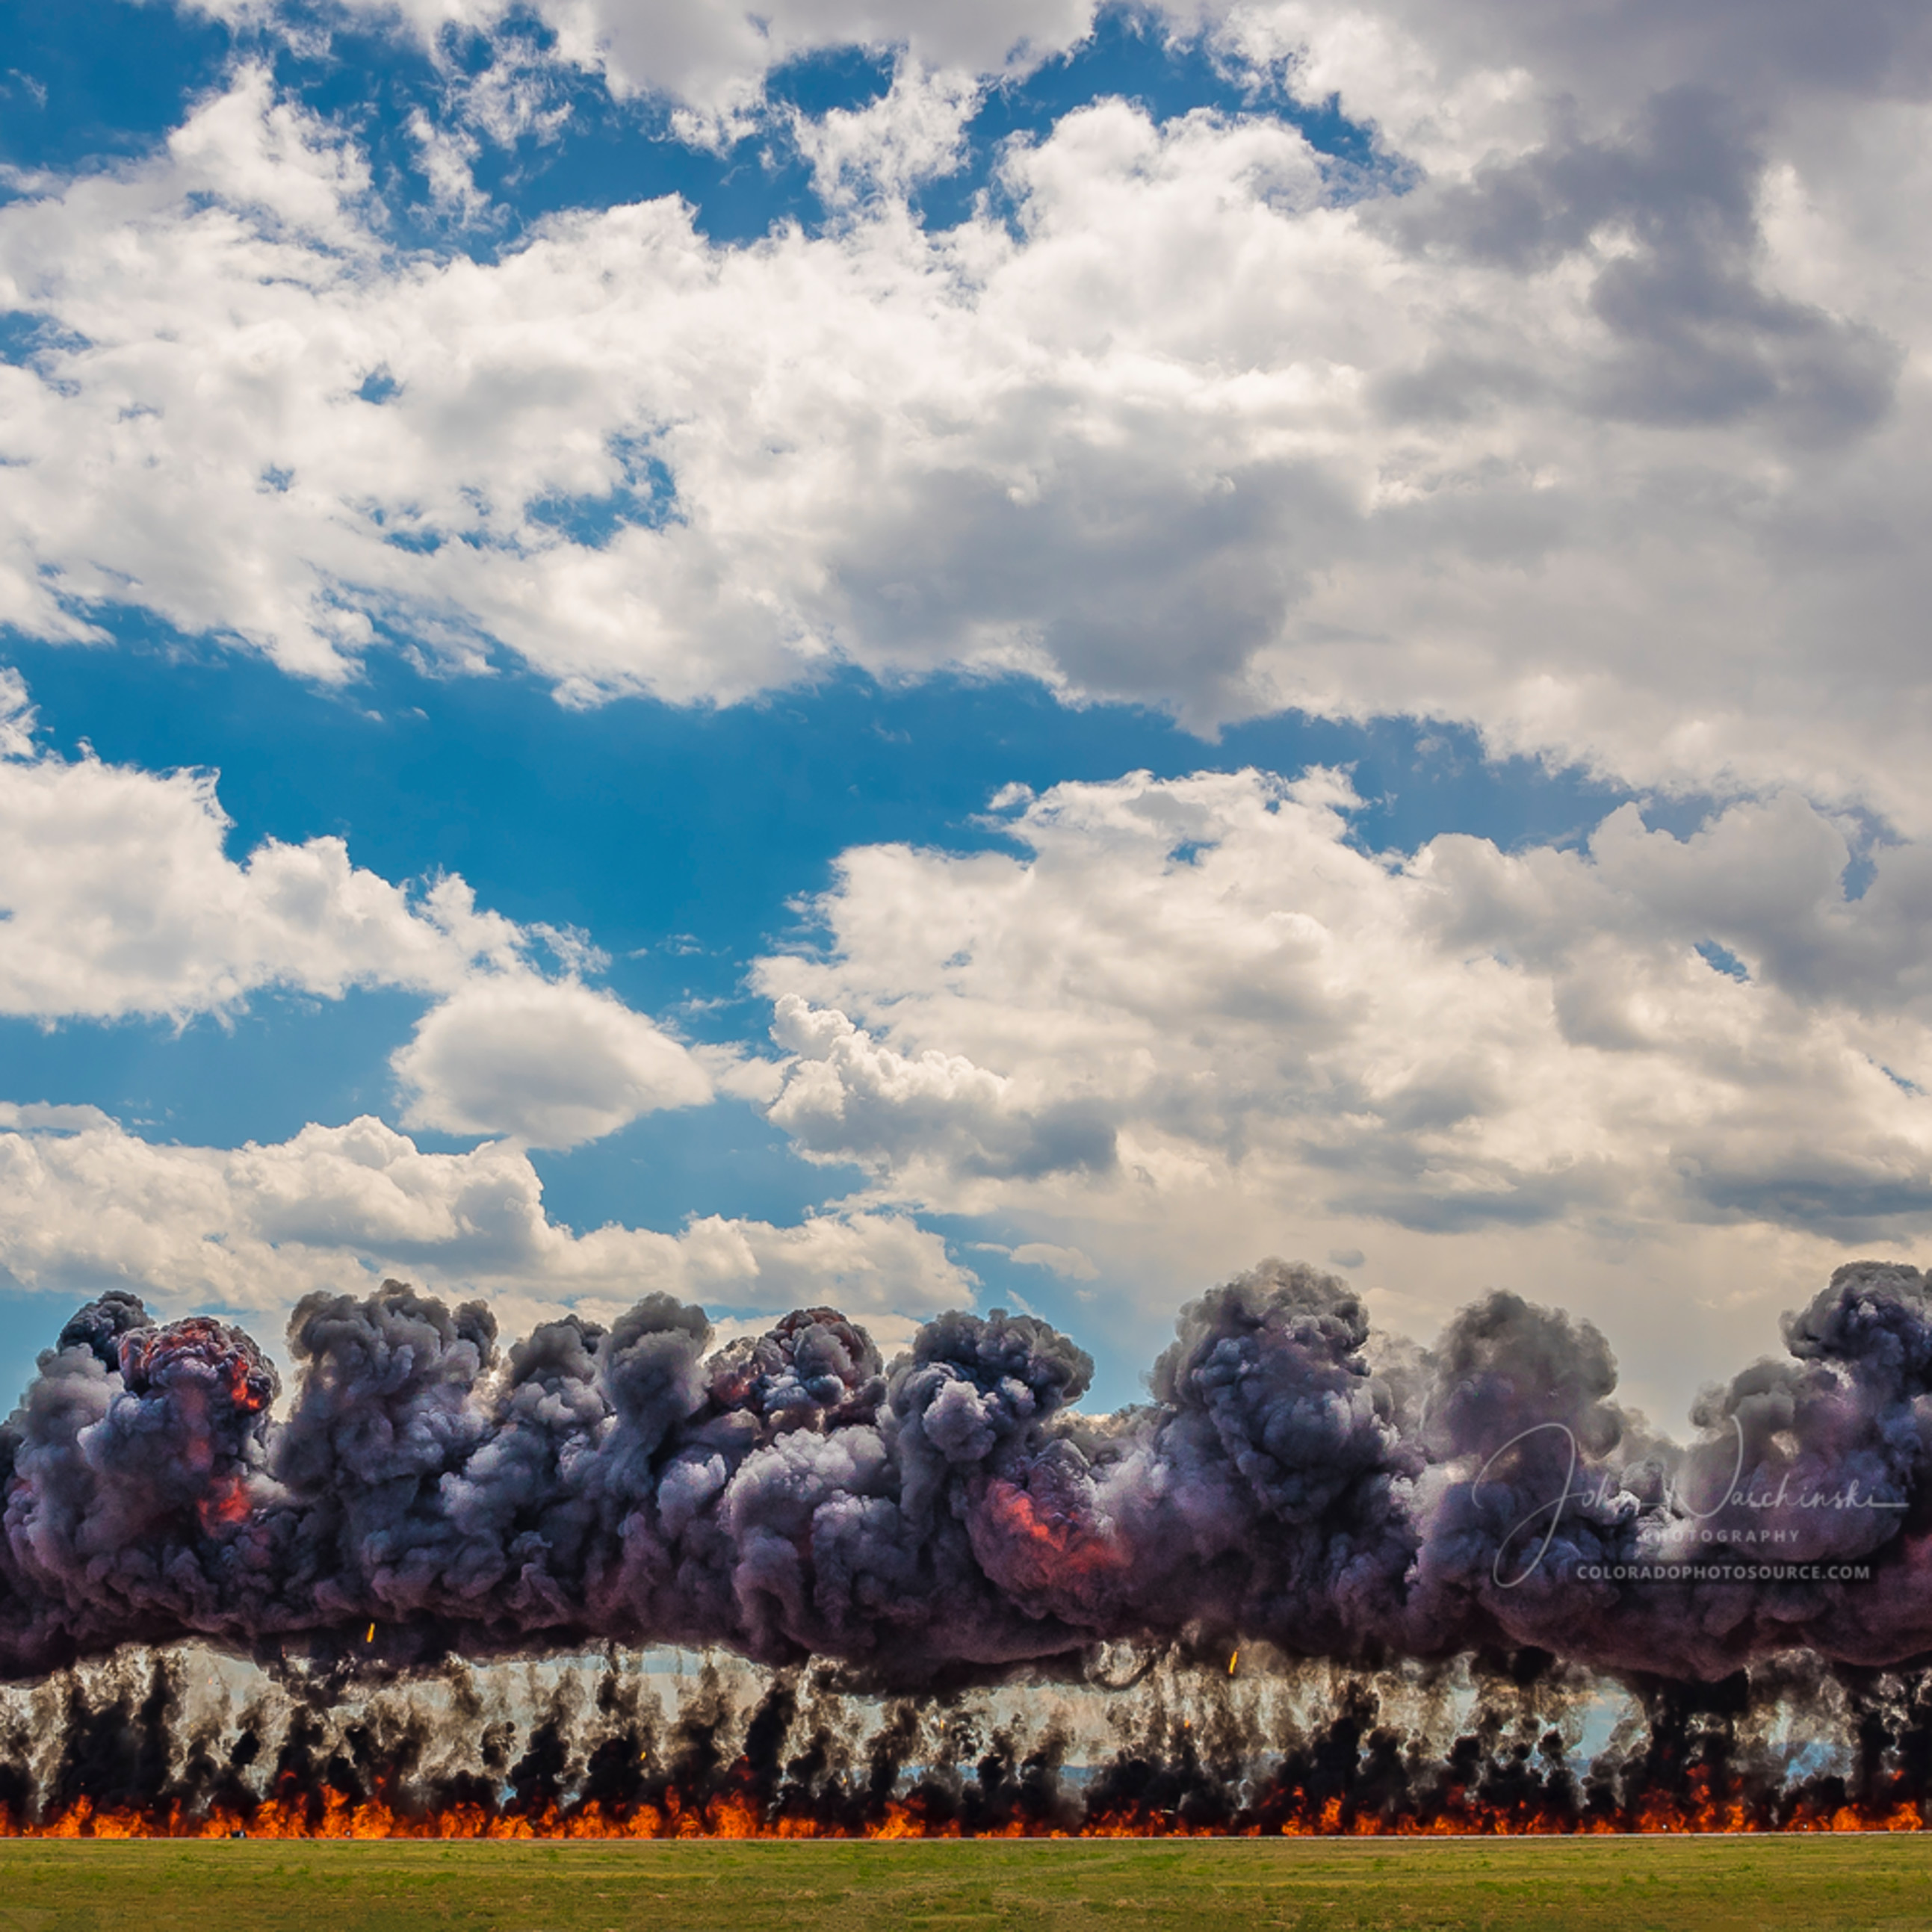 Colorado photosbombing run3 nwv1jc